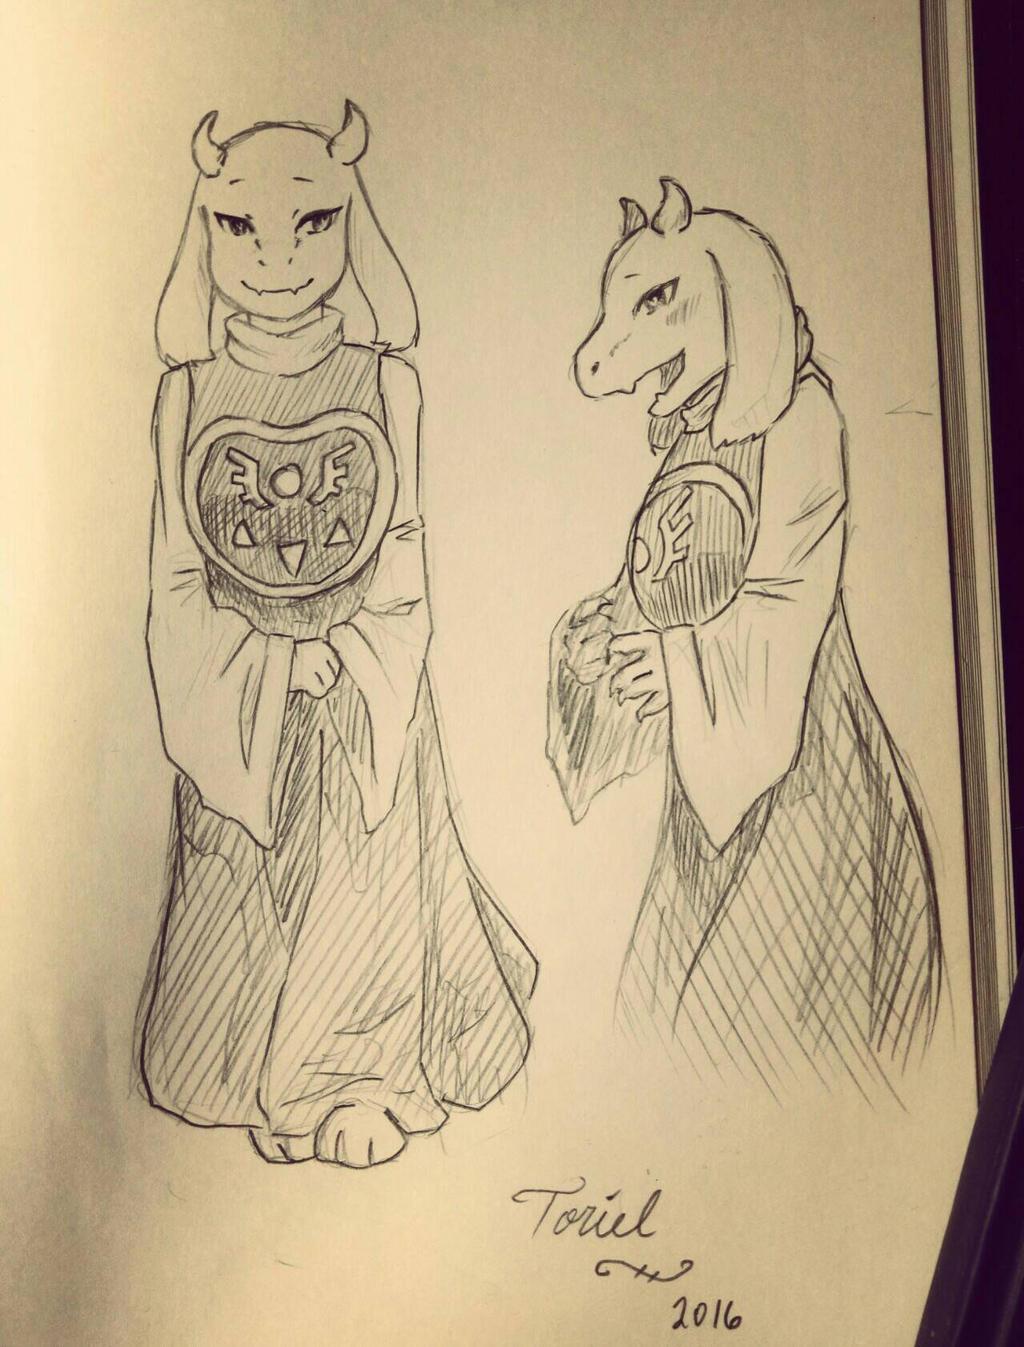 Toriel Sketch by Kamikoroshu